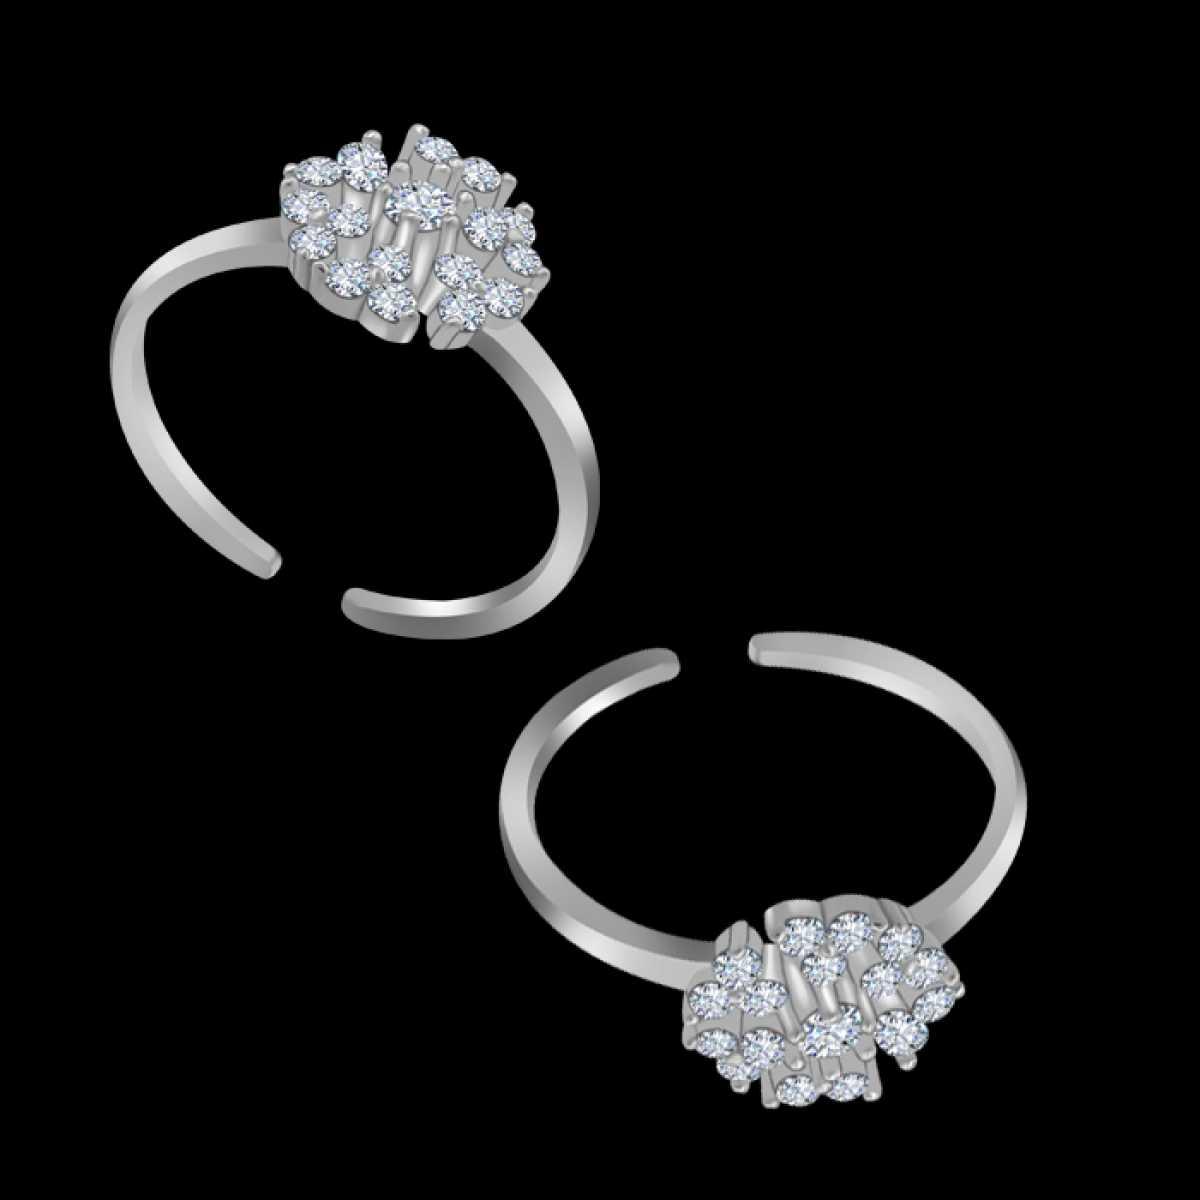 Small Triangle Silver Toe Ring